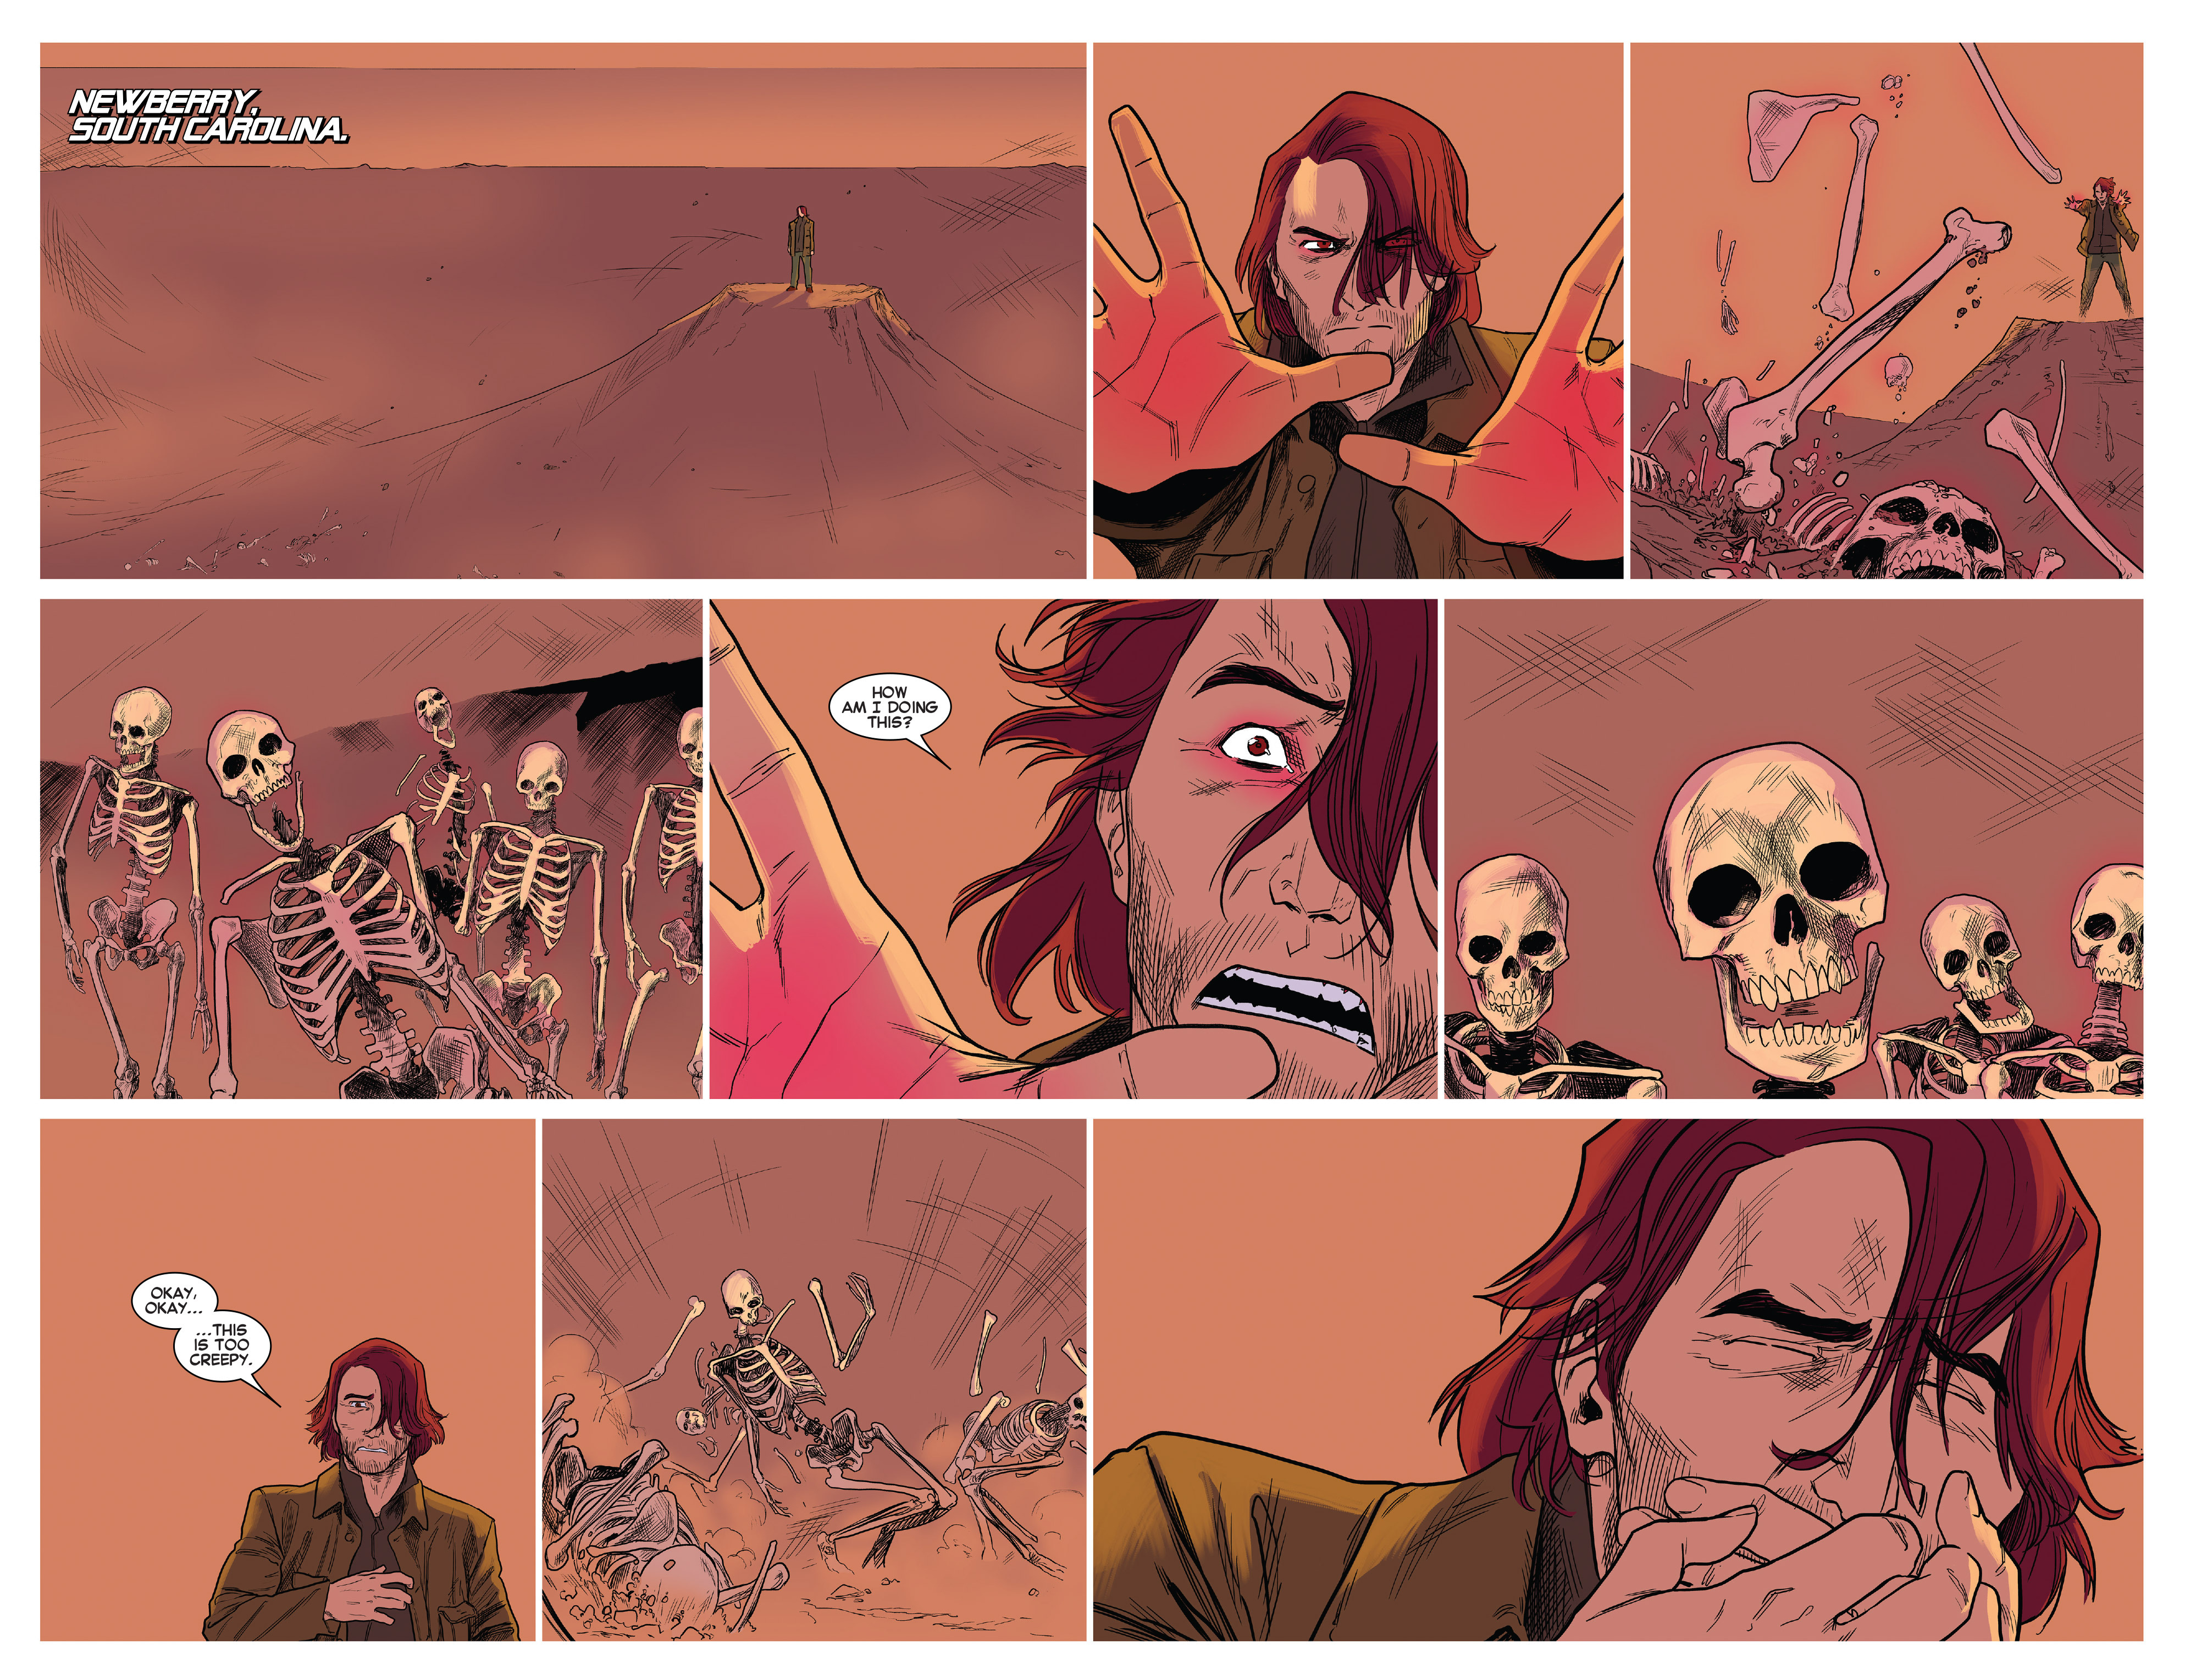 Read online Uncanny X-Men (2013) comic -  Issue # _TPB 5 - The Omega Mutant - 9